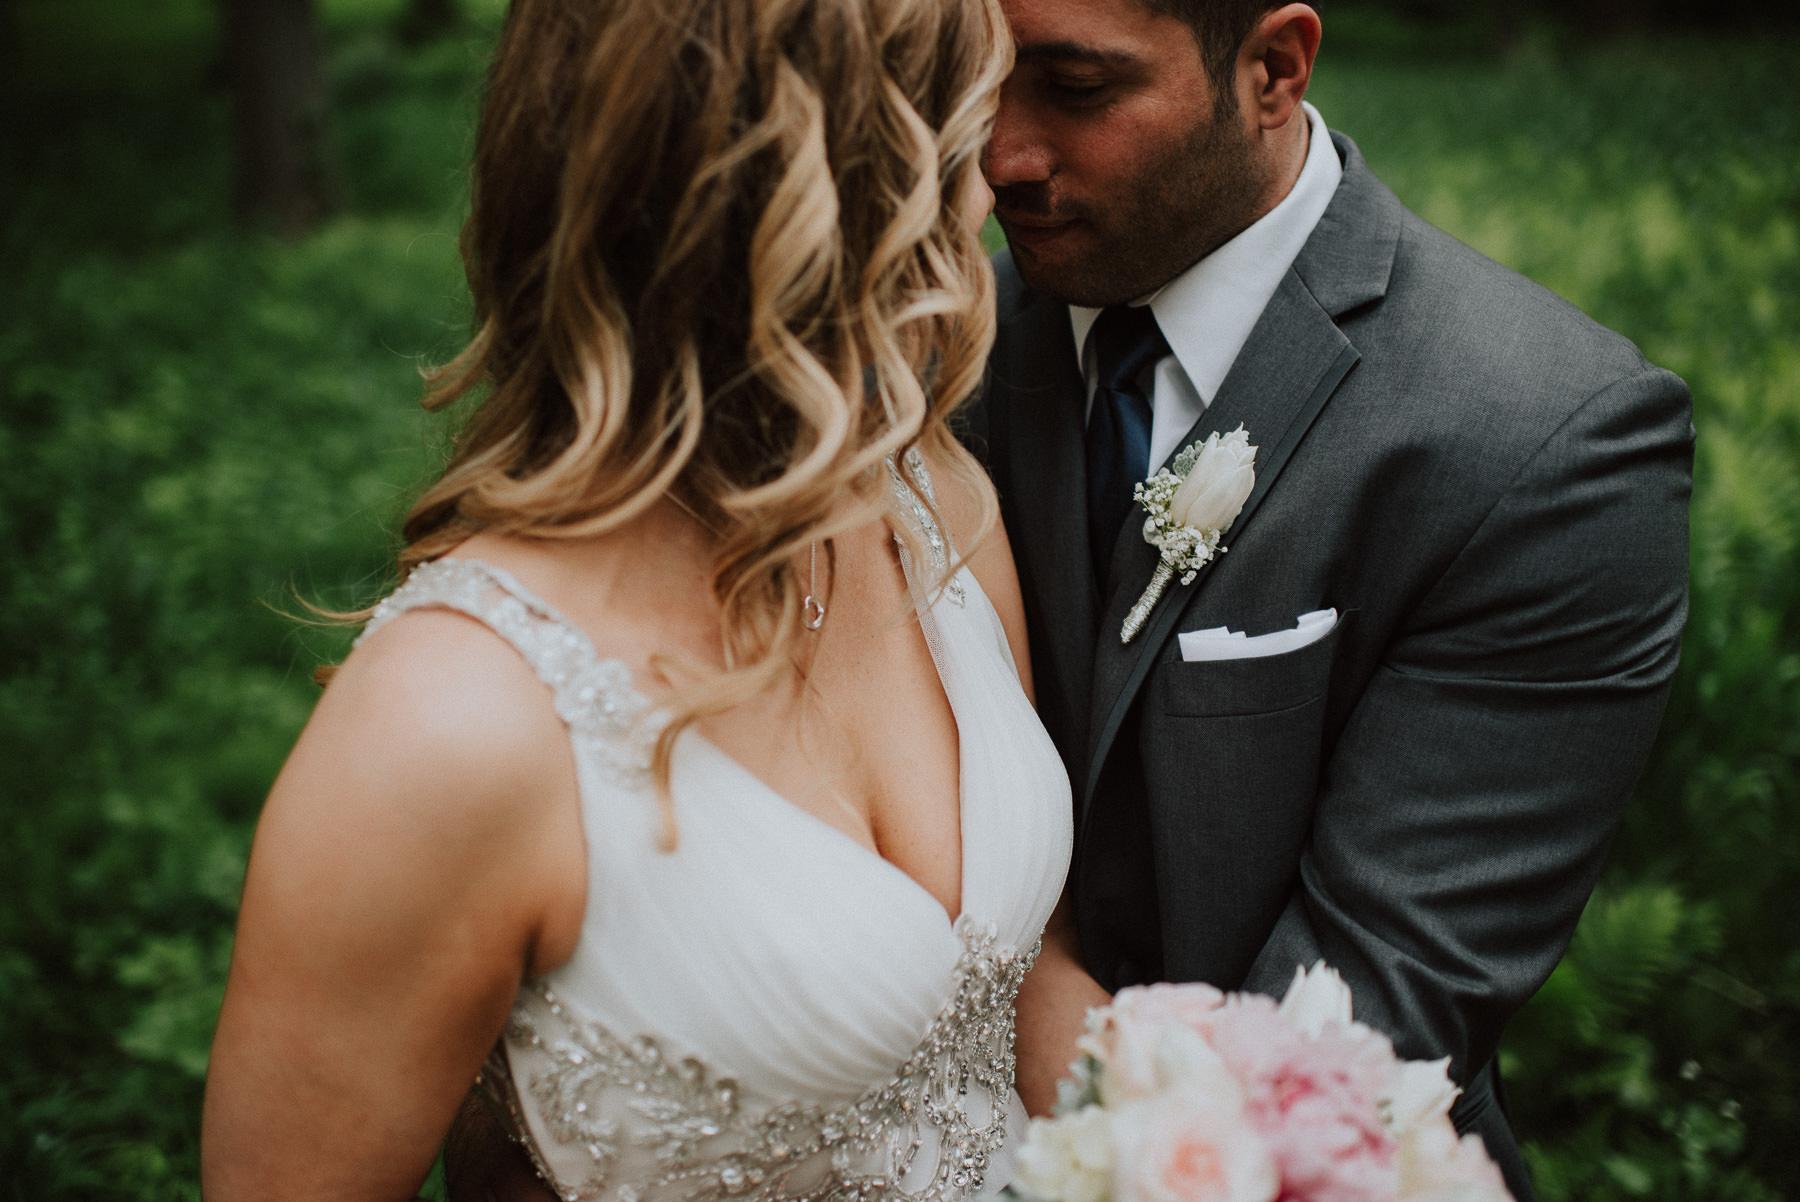 appleford-estate-wedding-photography-42.jpg